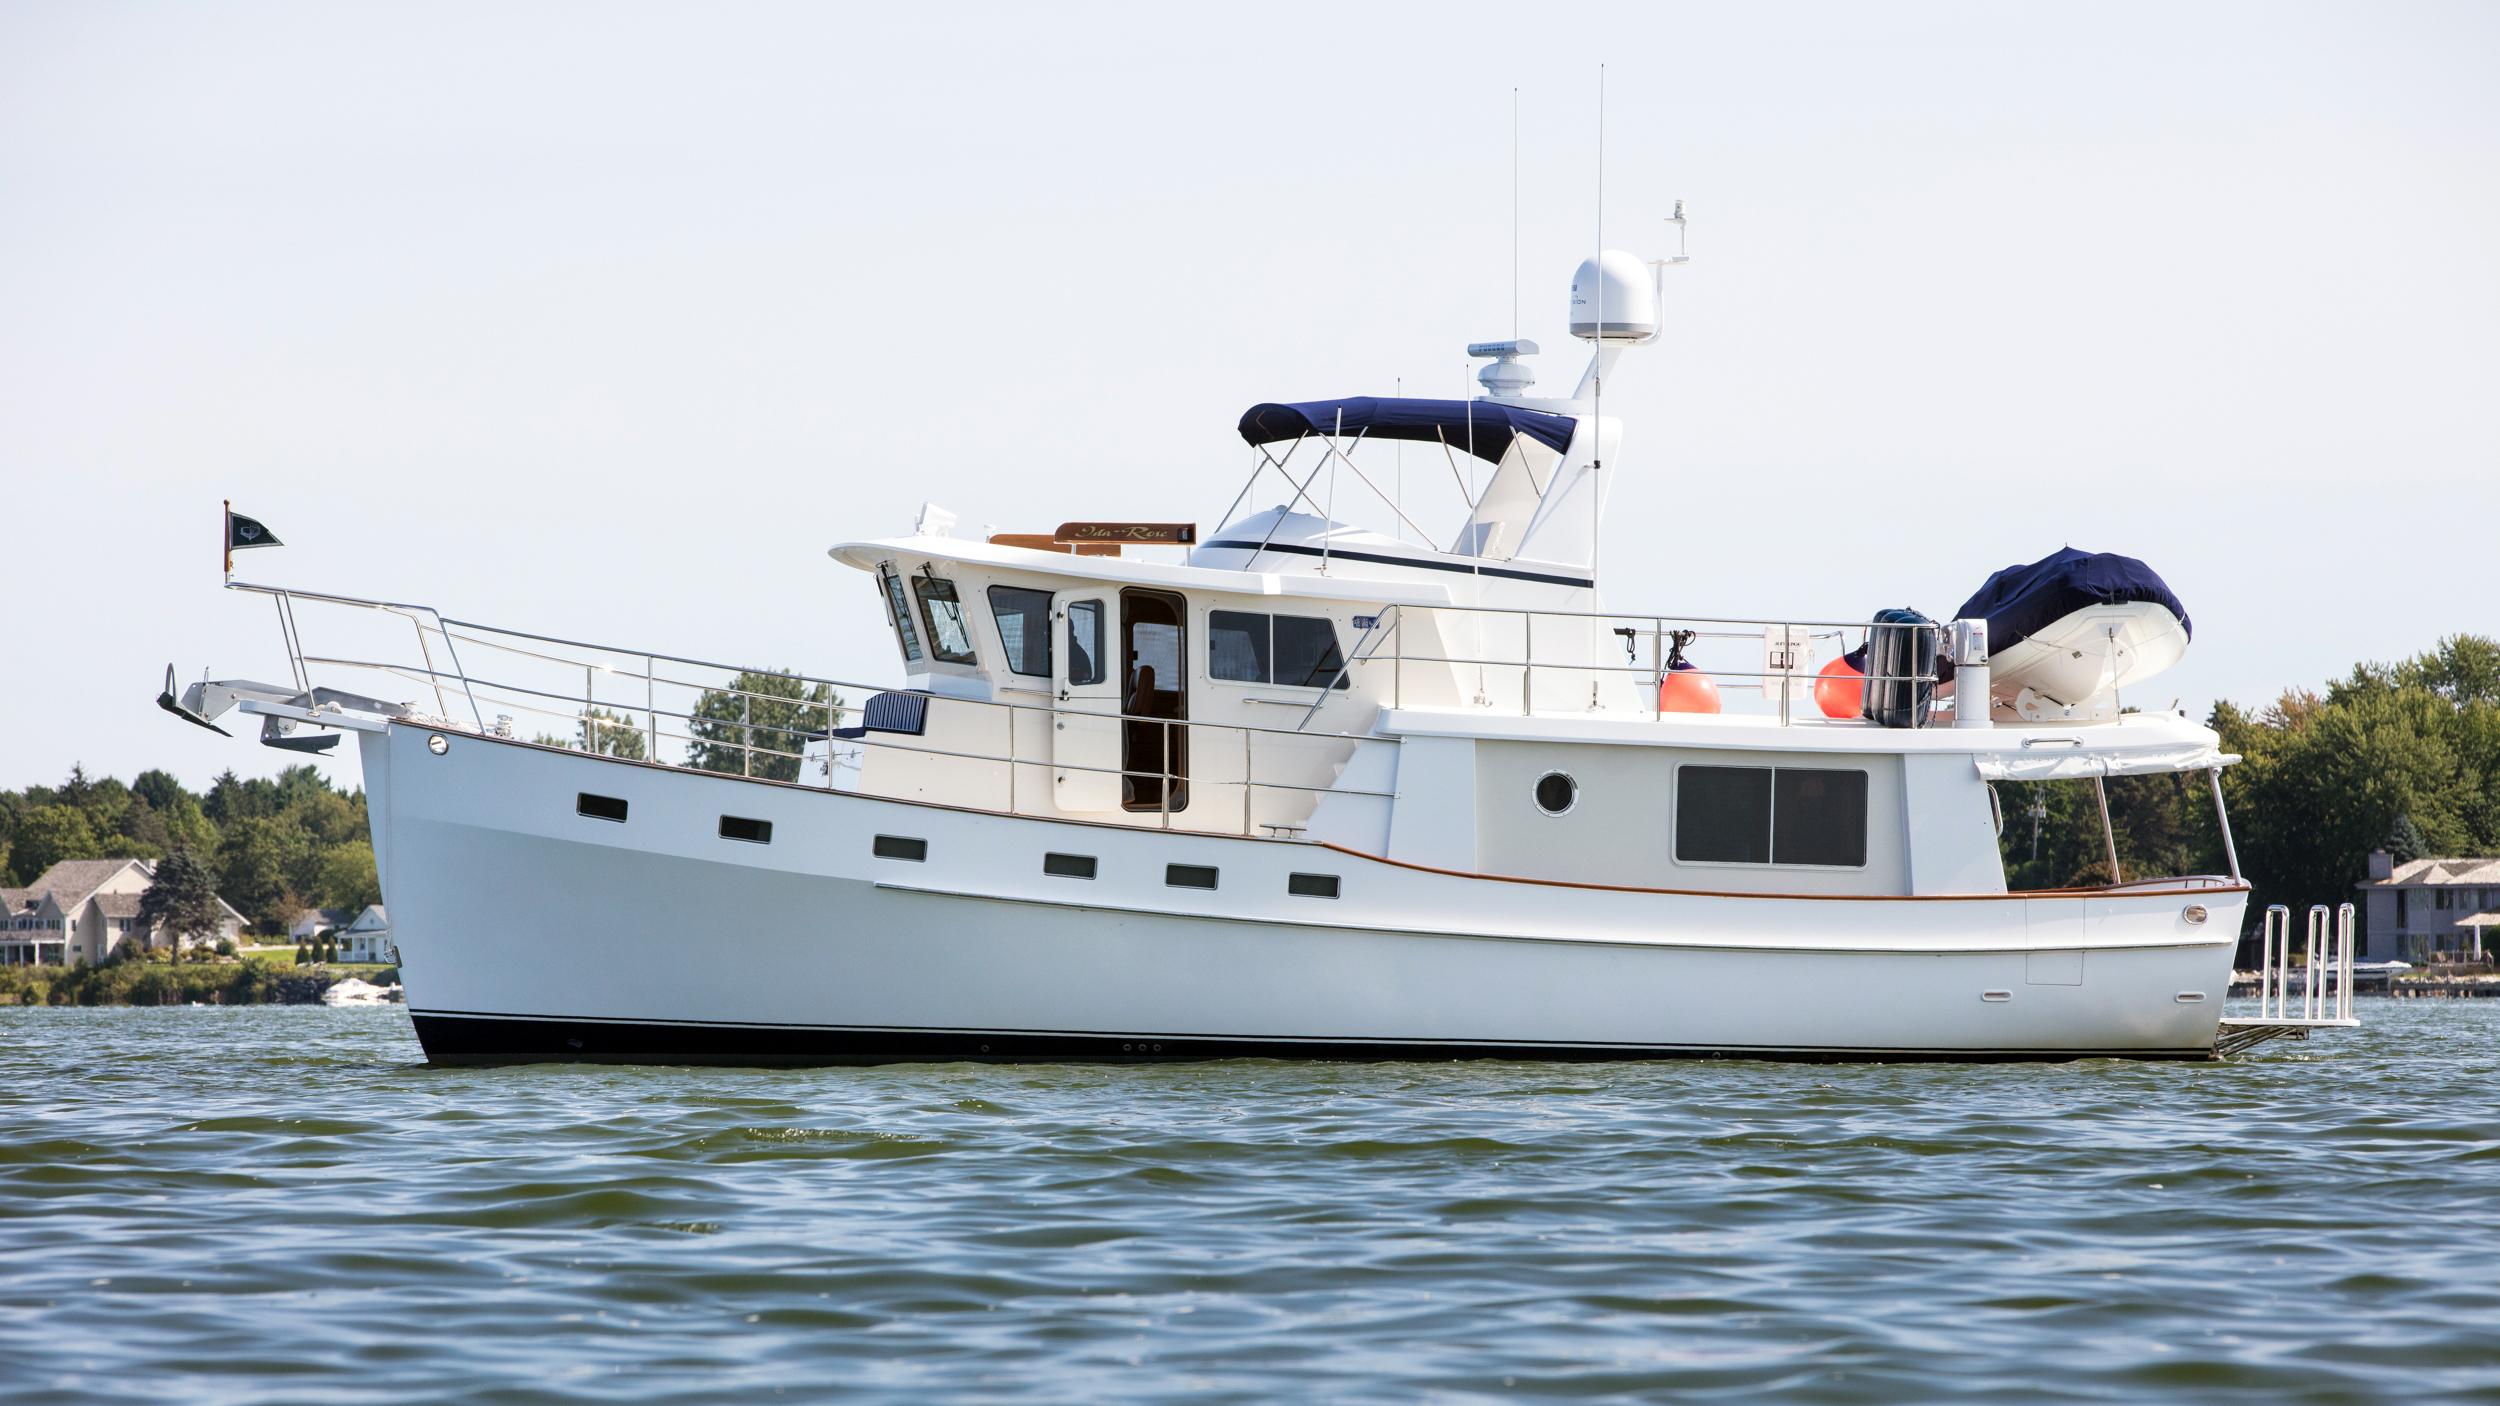 Used Kadey-Krogen Yachts for Sale